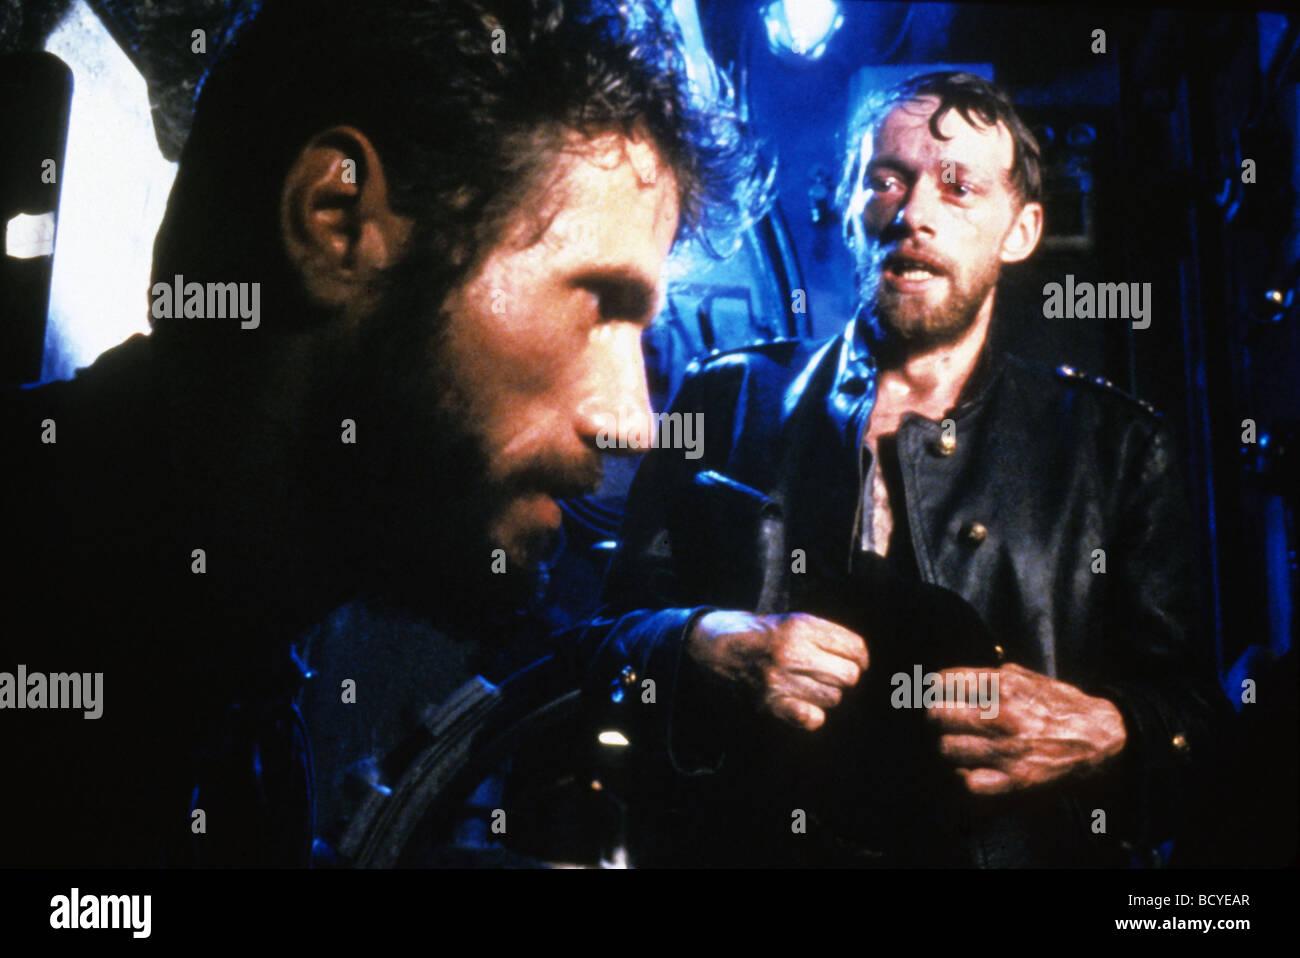 Das Boot Year :1981 Director : Wolfgang Petersen Jurgen Prochnow, Herbert Grönemeyer, - Stock Image